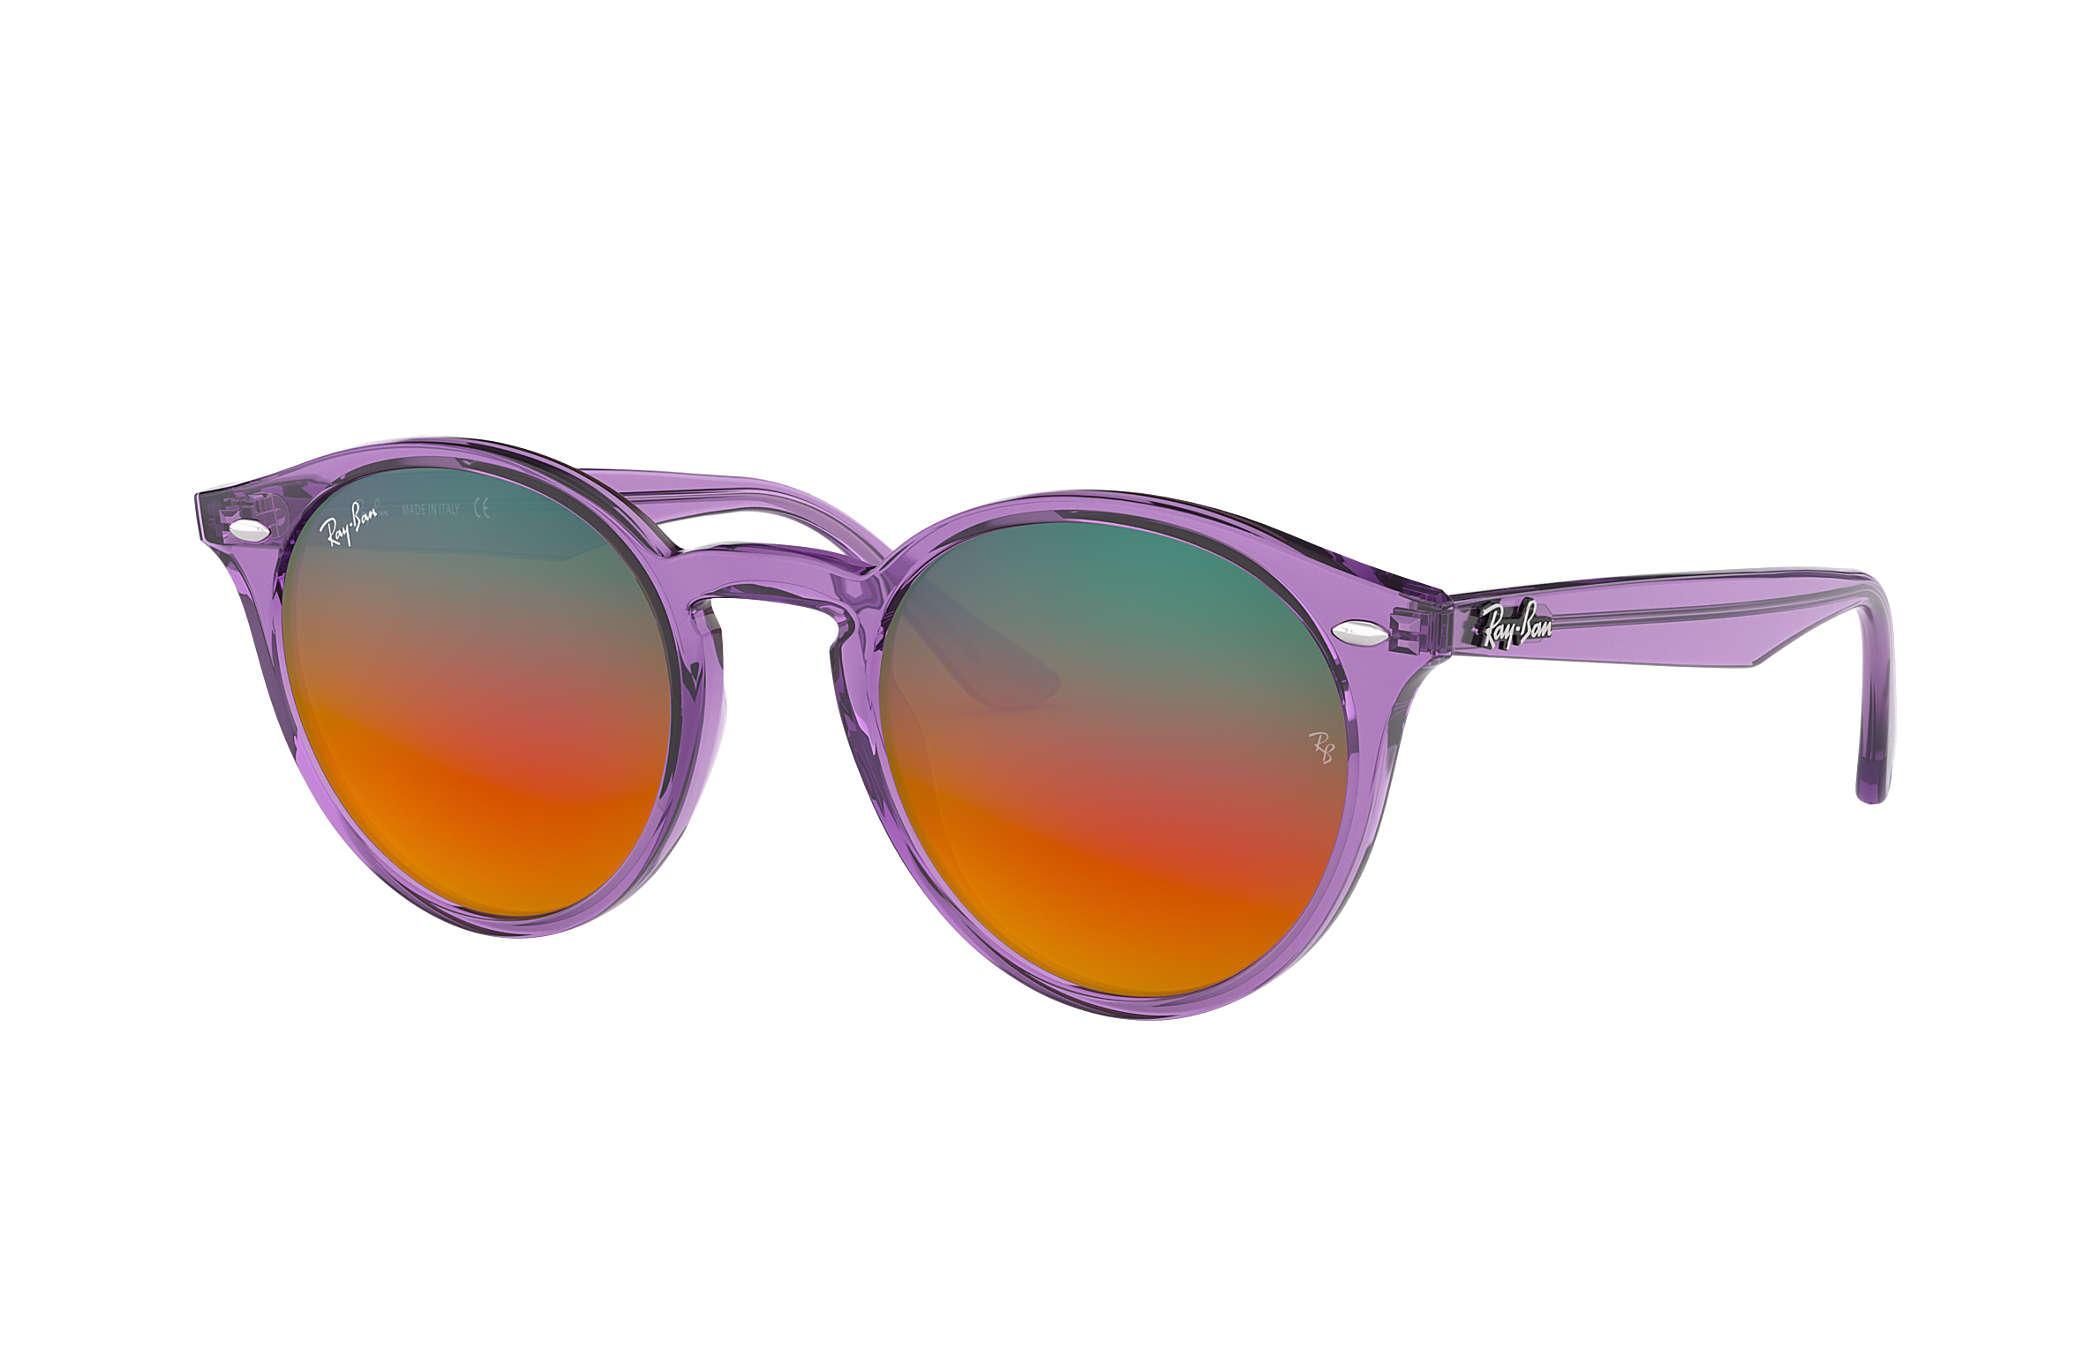 86b9e2dd59 Ray-Ban RB2180 Violet - Propionate - Orange Lenses - 0RB21806280A851 ...